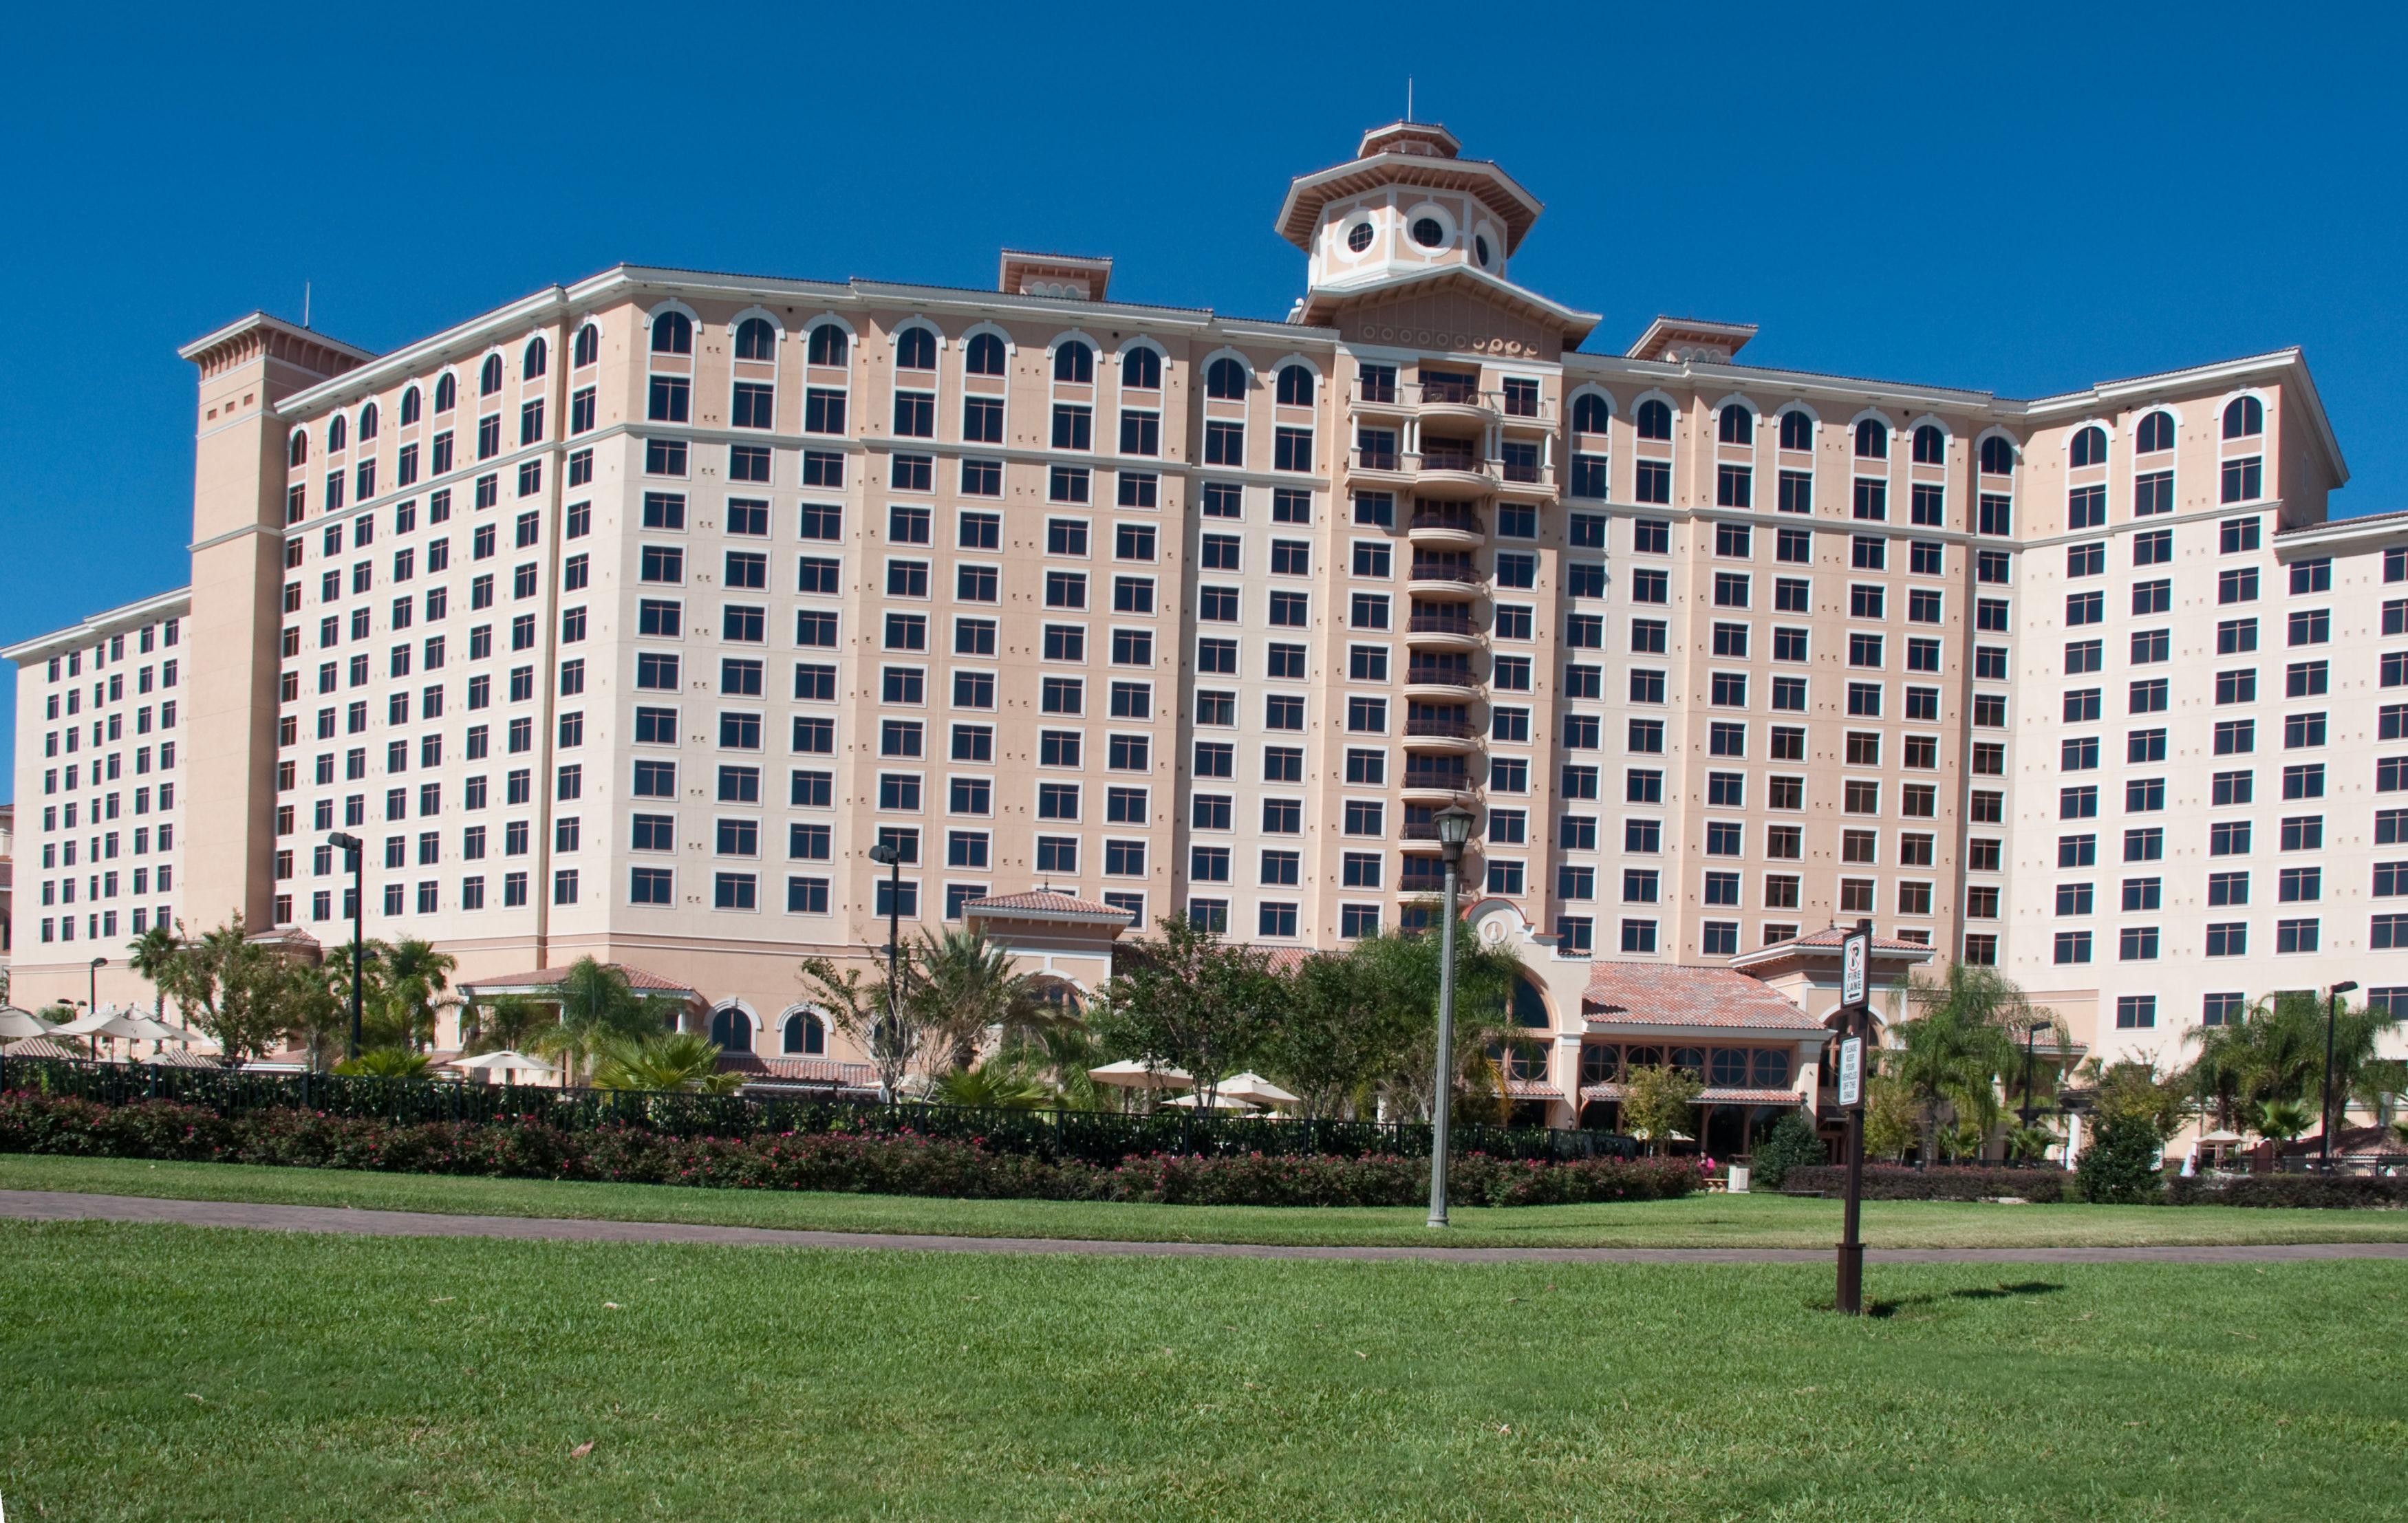 Rosen_Shingle_Creek_Hotel_Orlando_Florida_Nov._2009-3500x2214.jpg